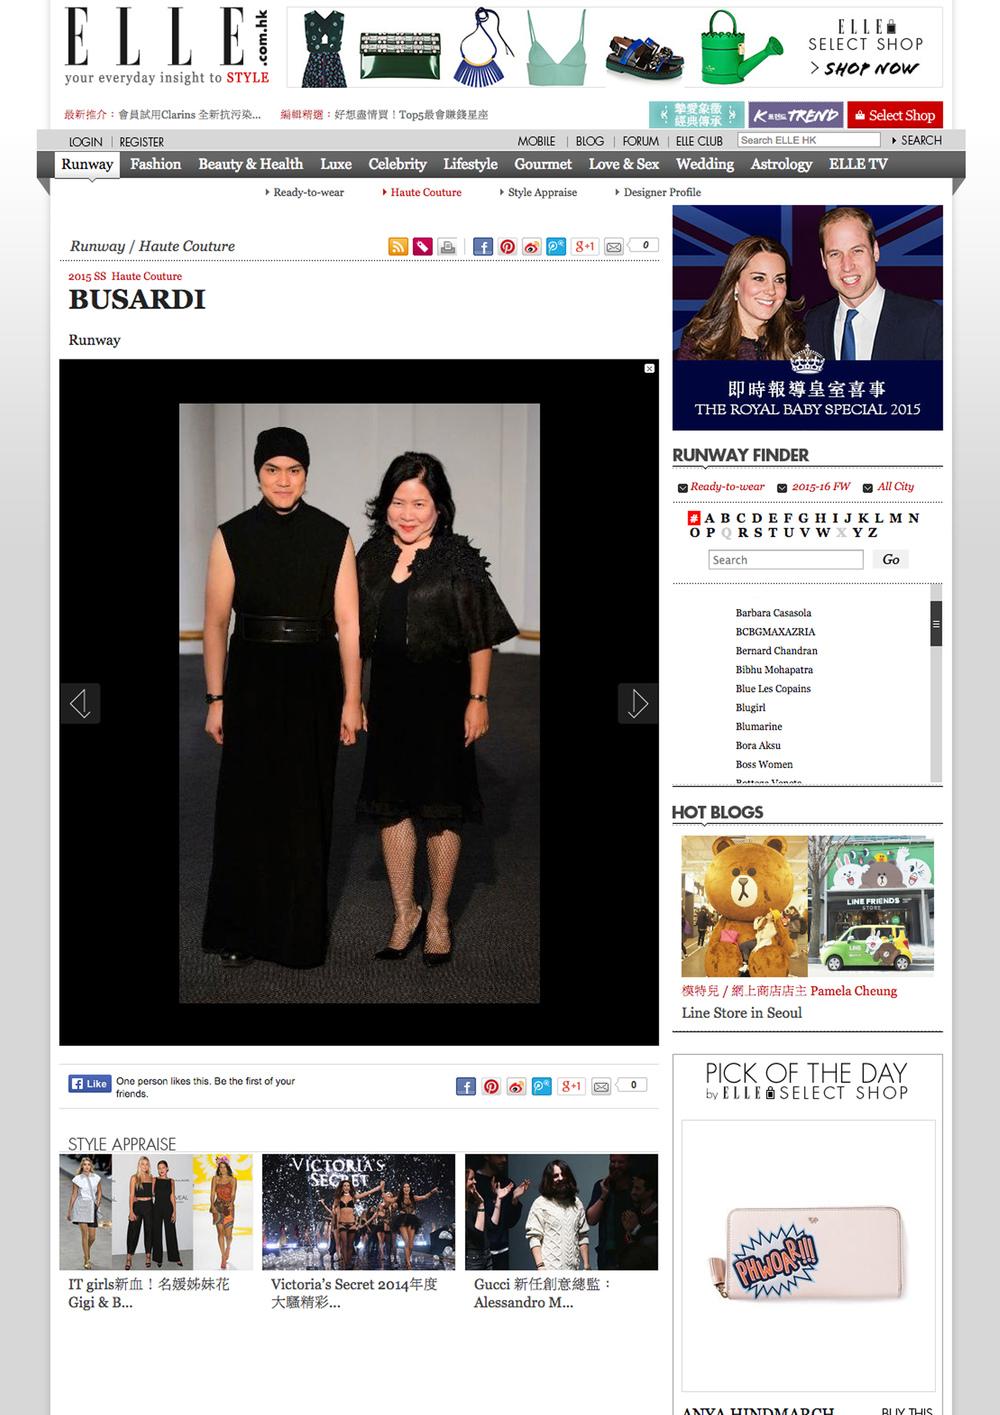 TUCK - ELLE HK - JANUARY 2015 - 01.jpg